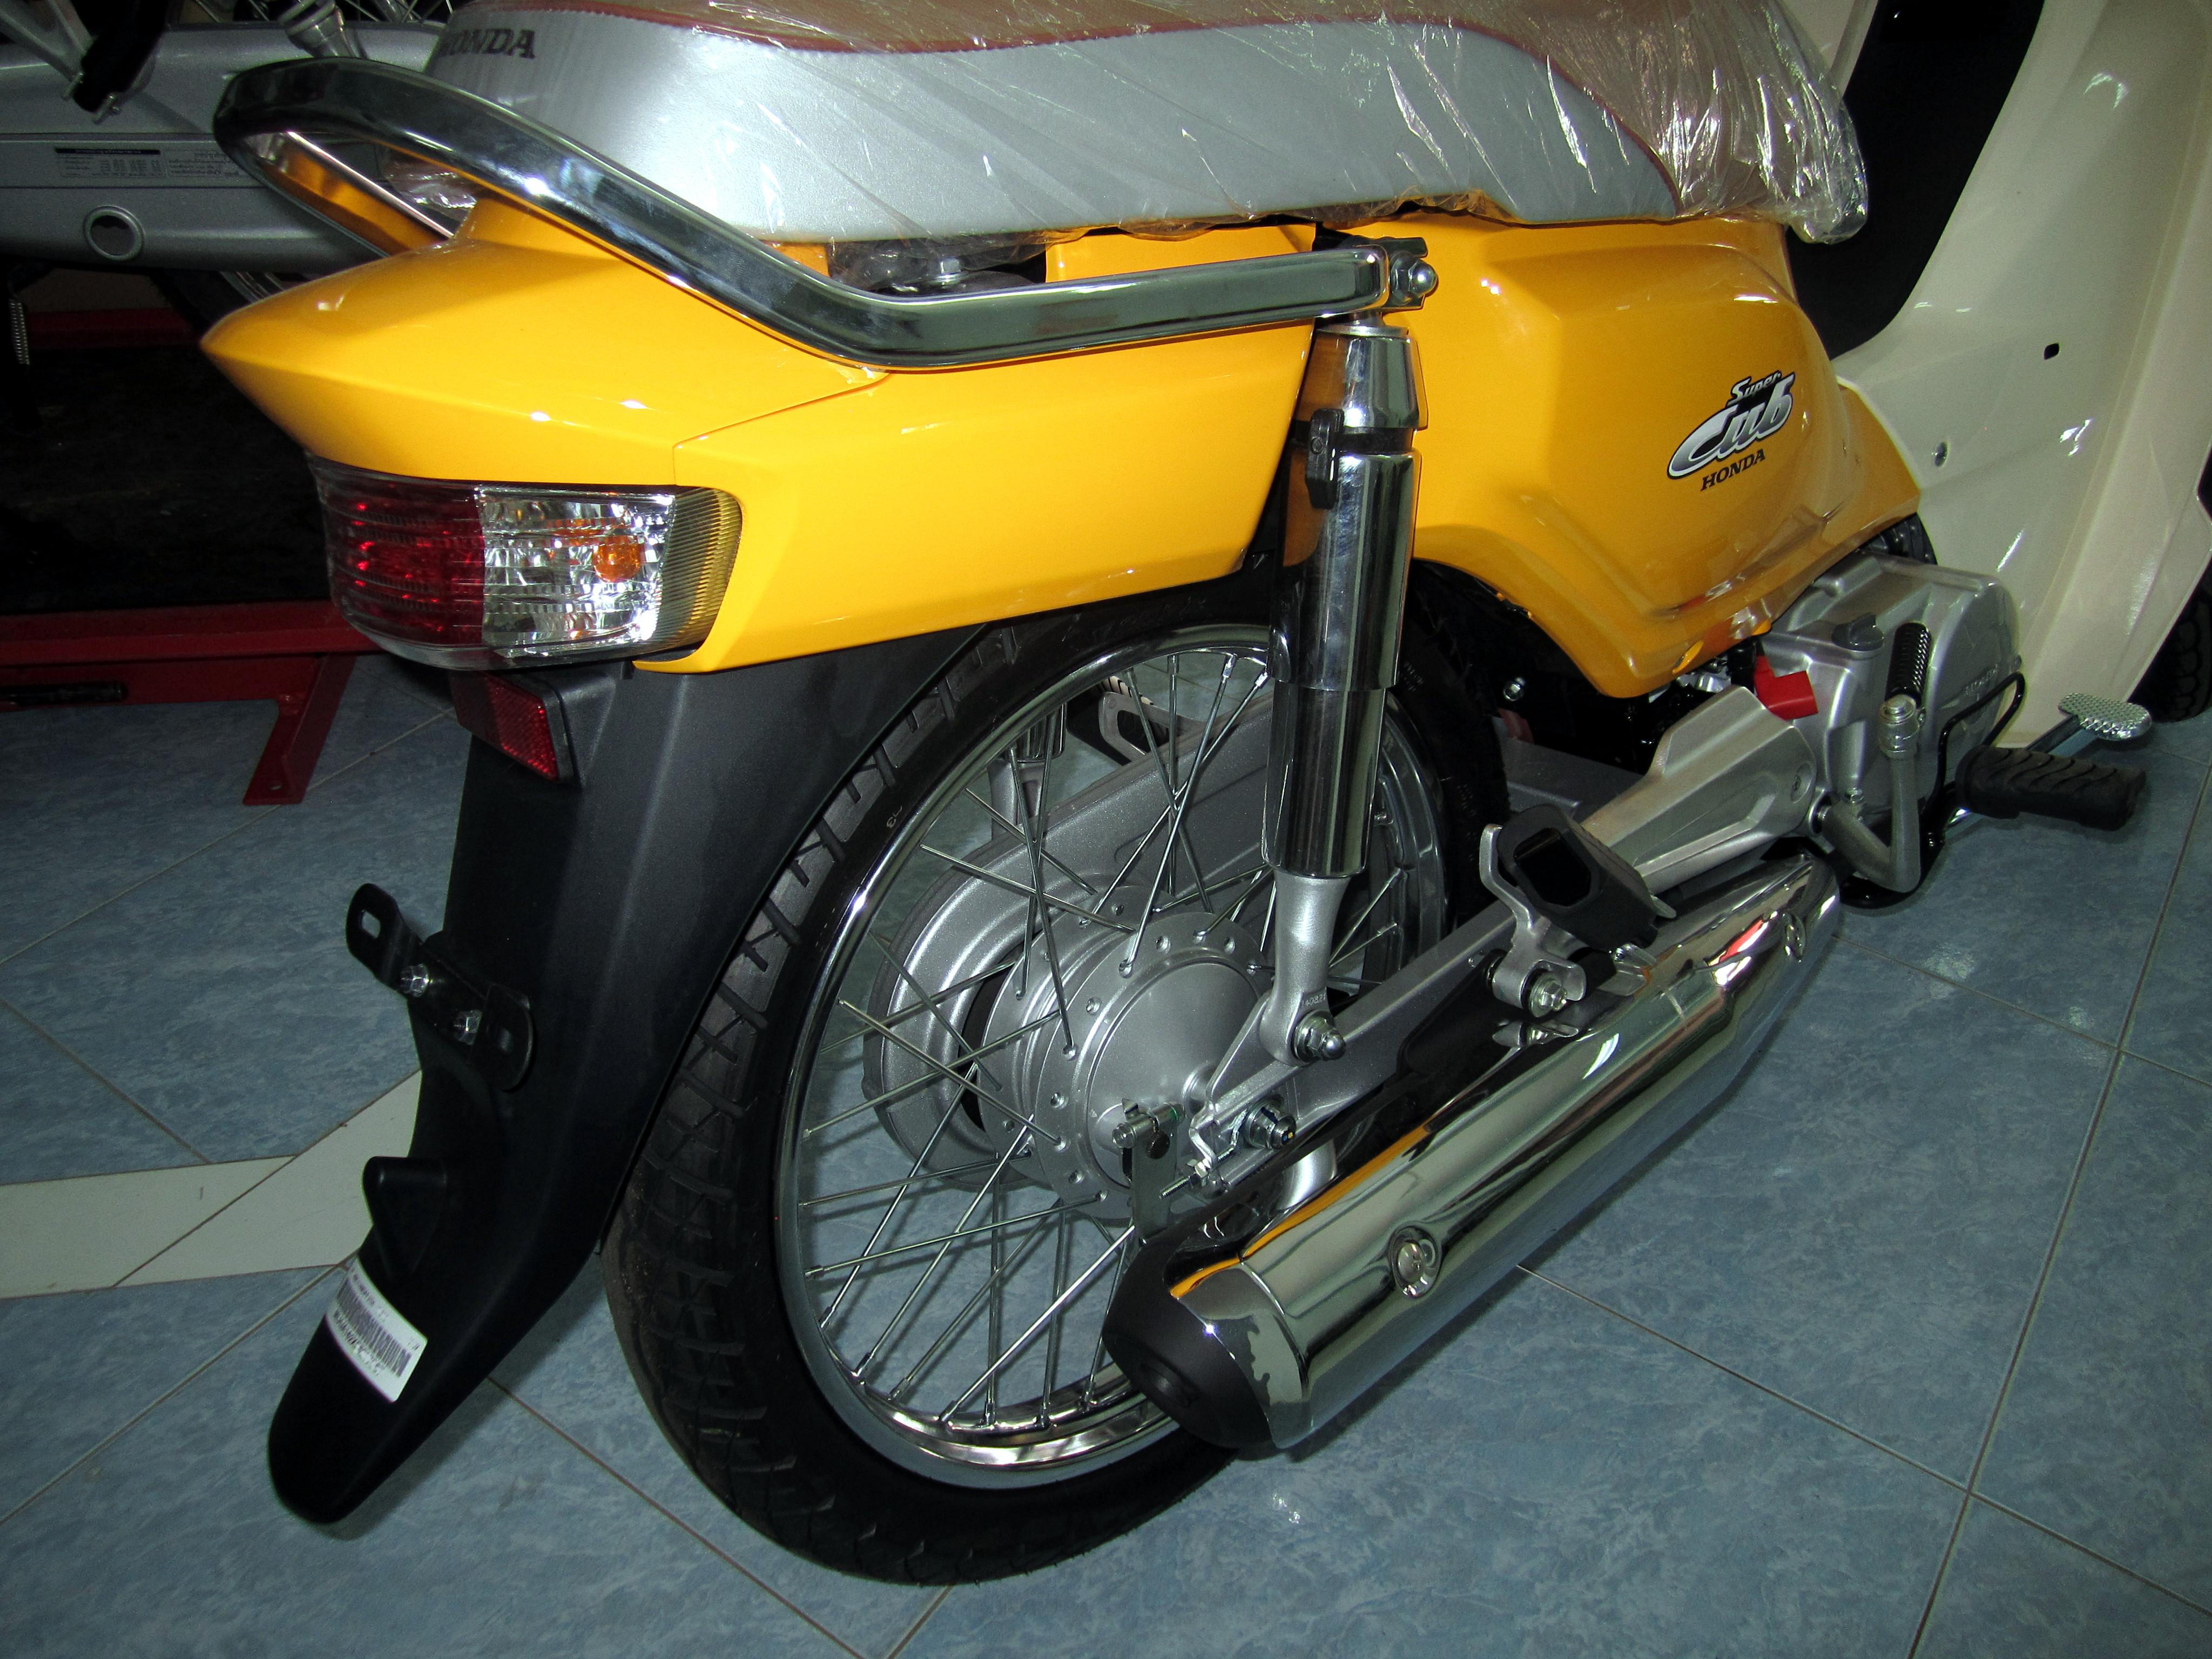 Build A Honda >> File:Honda Dream 110i Super Cub ND110M 2014 Rear.JPG - Wikimedia Commons